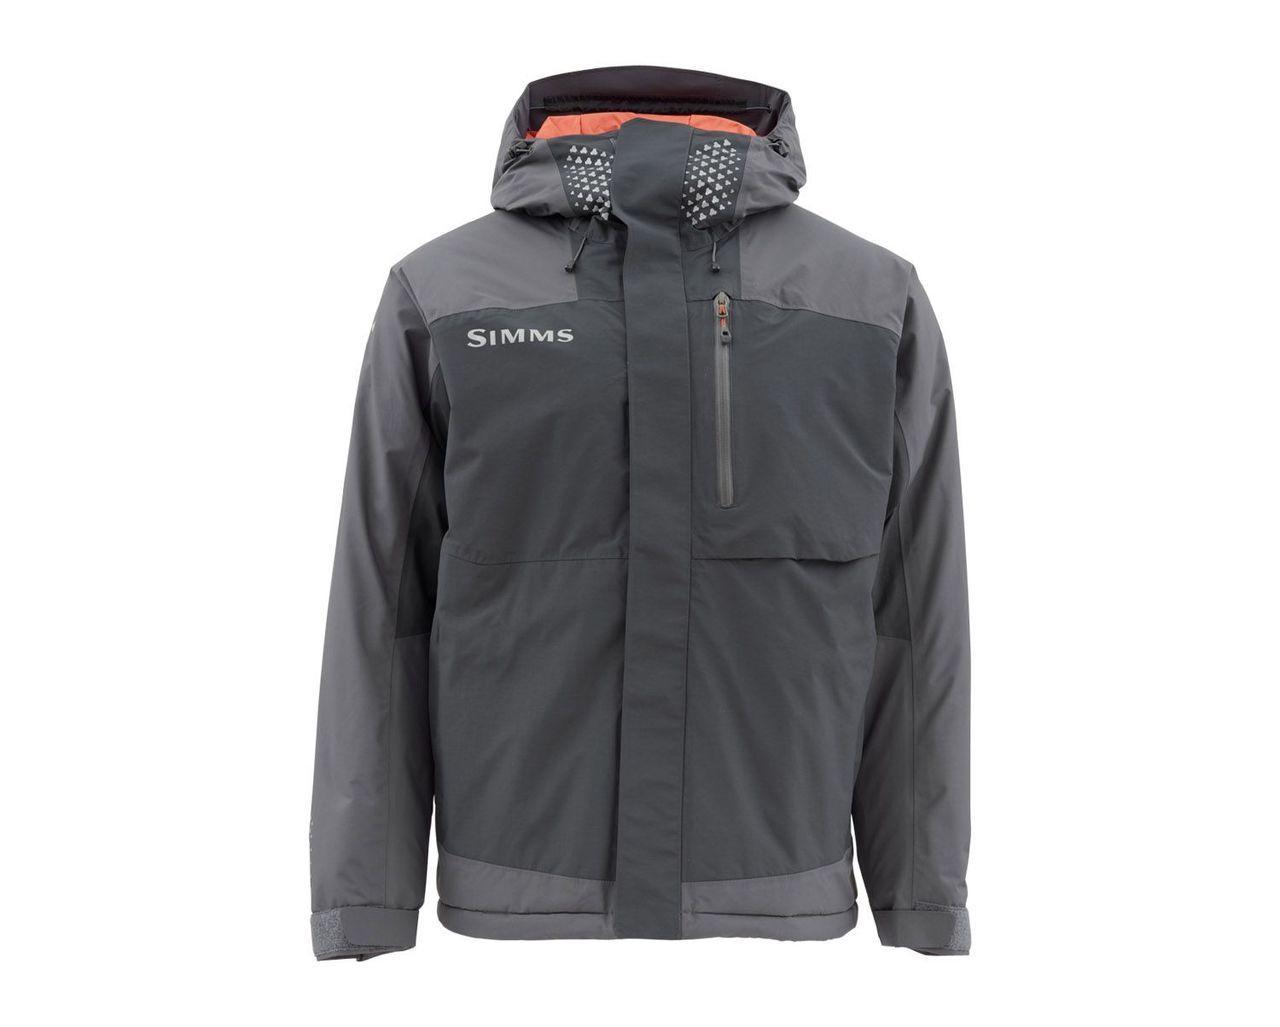 Simms Challenger Insulated Jacket zateplená bunda na loď - monfish 02aeb74008